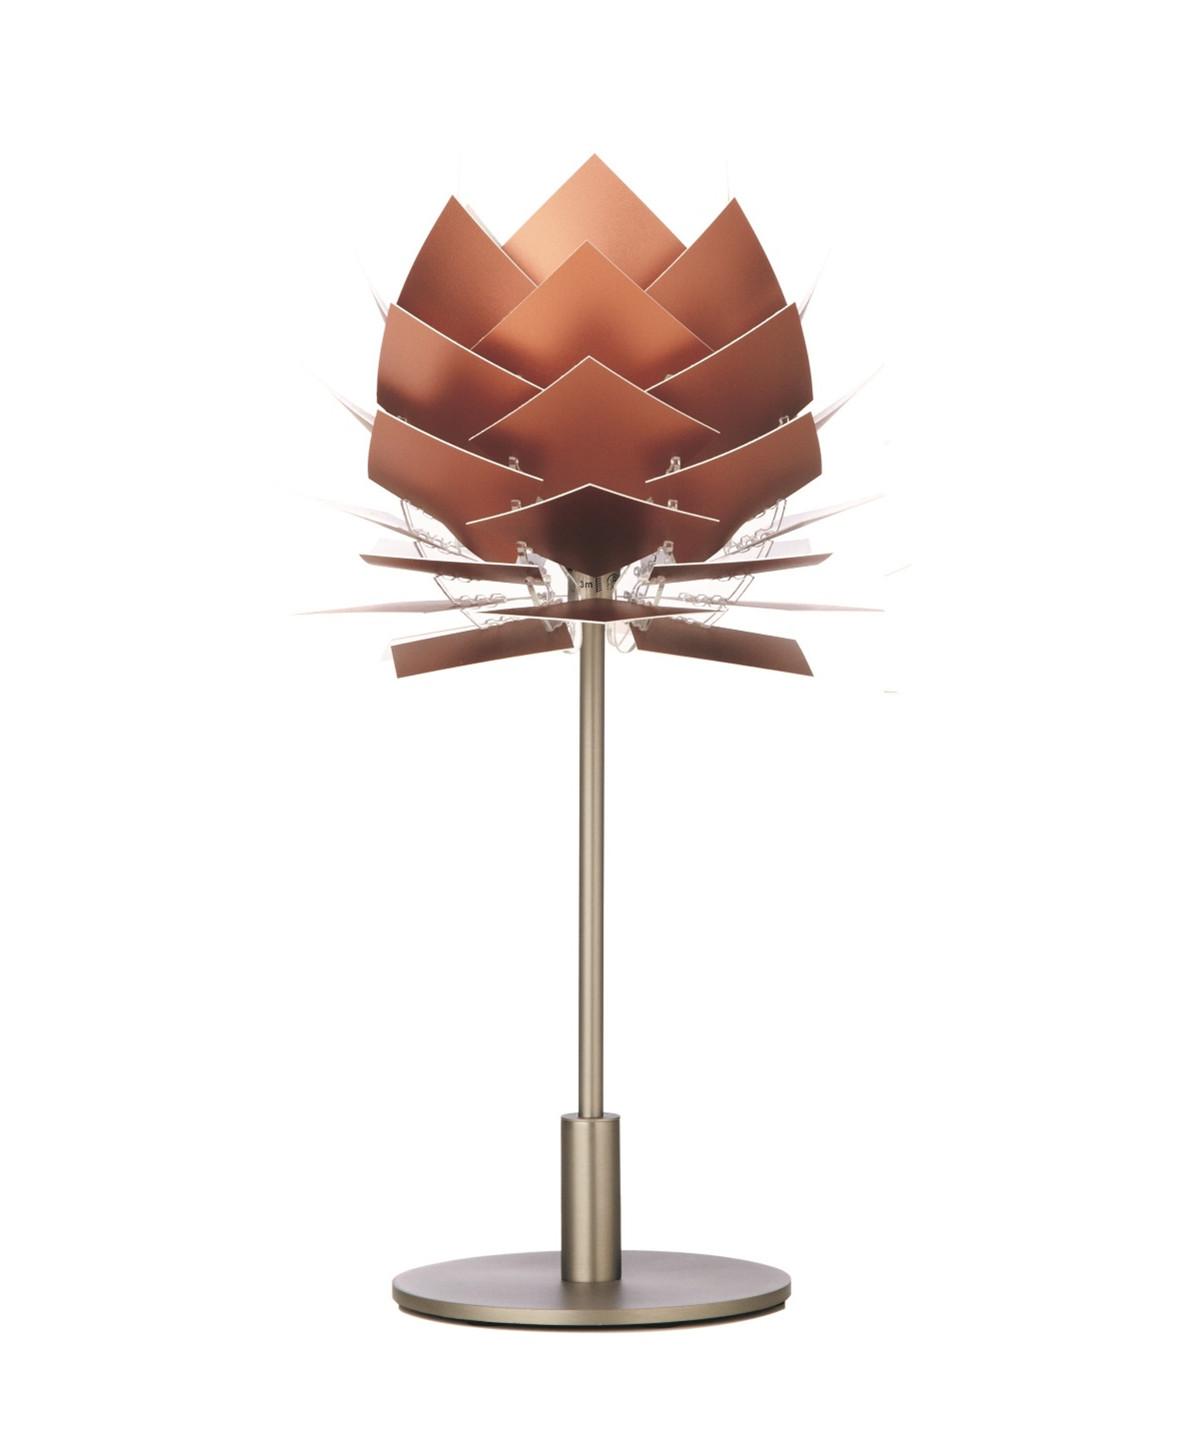 PineApple XS Bordlampe Kobber Look - DybergLarsen